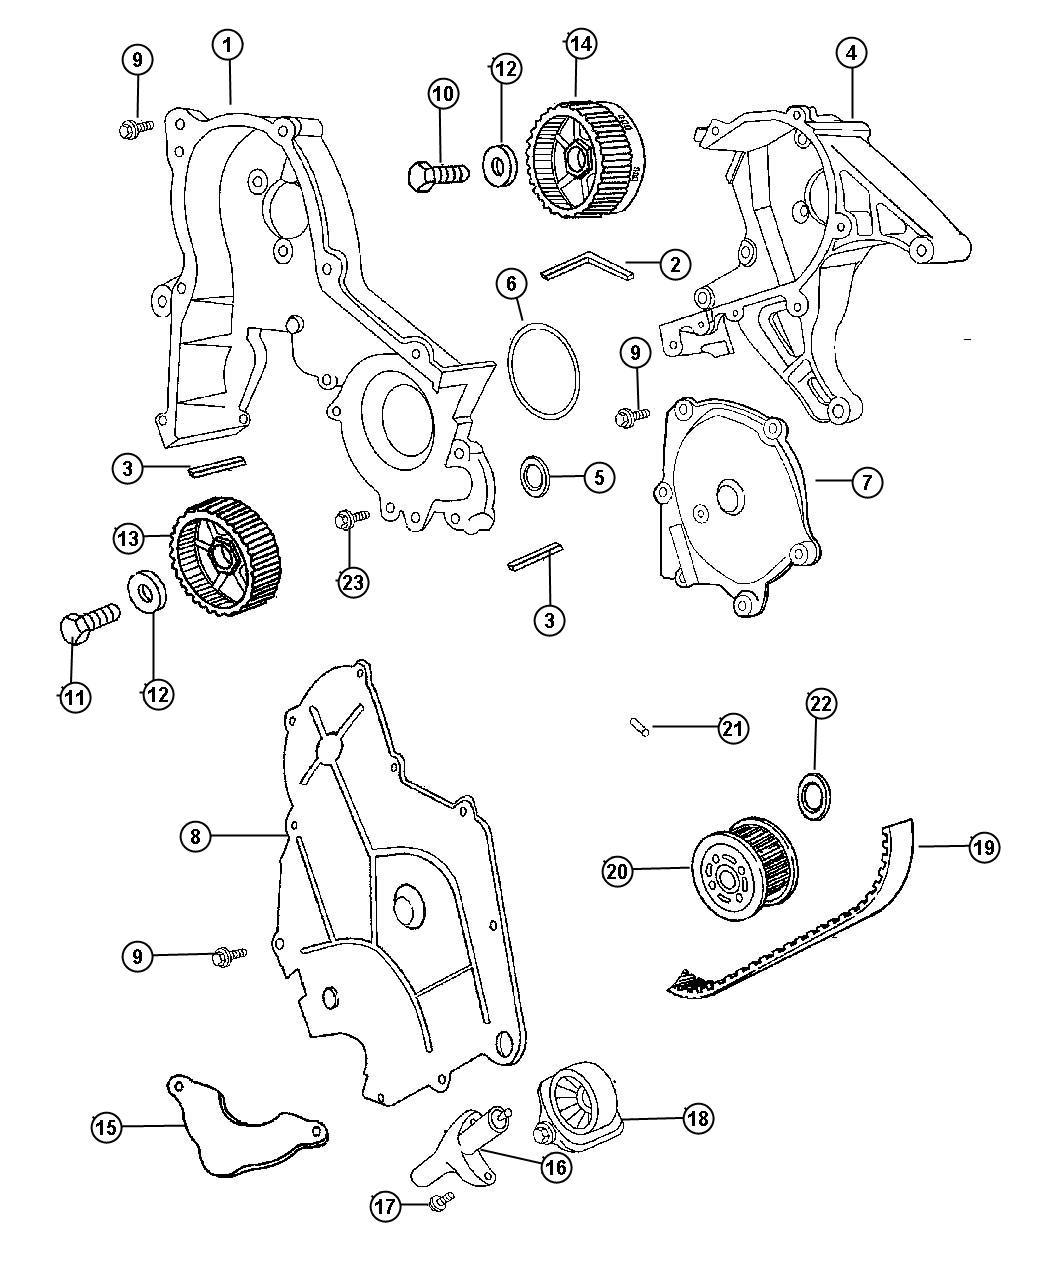 Chrysler Concorde Tensioner Arm Pivot Mouting